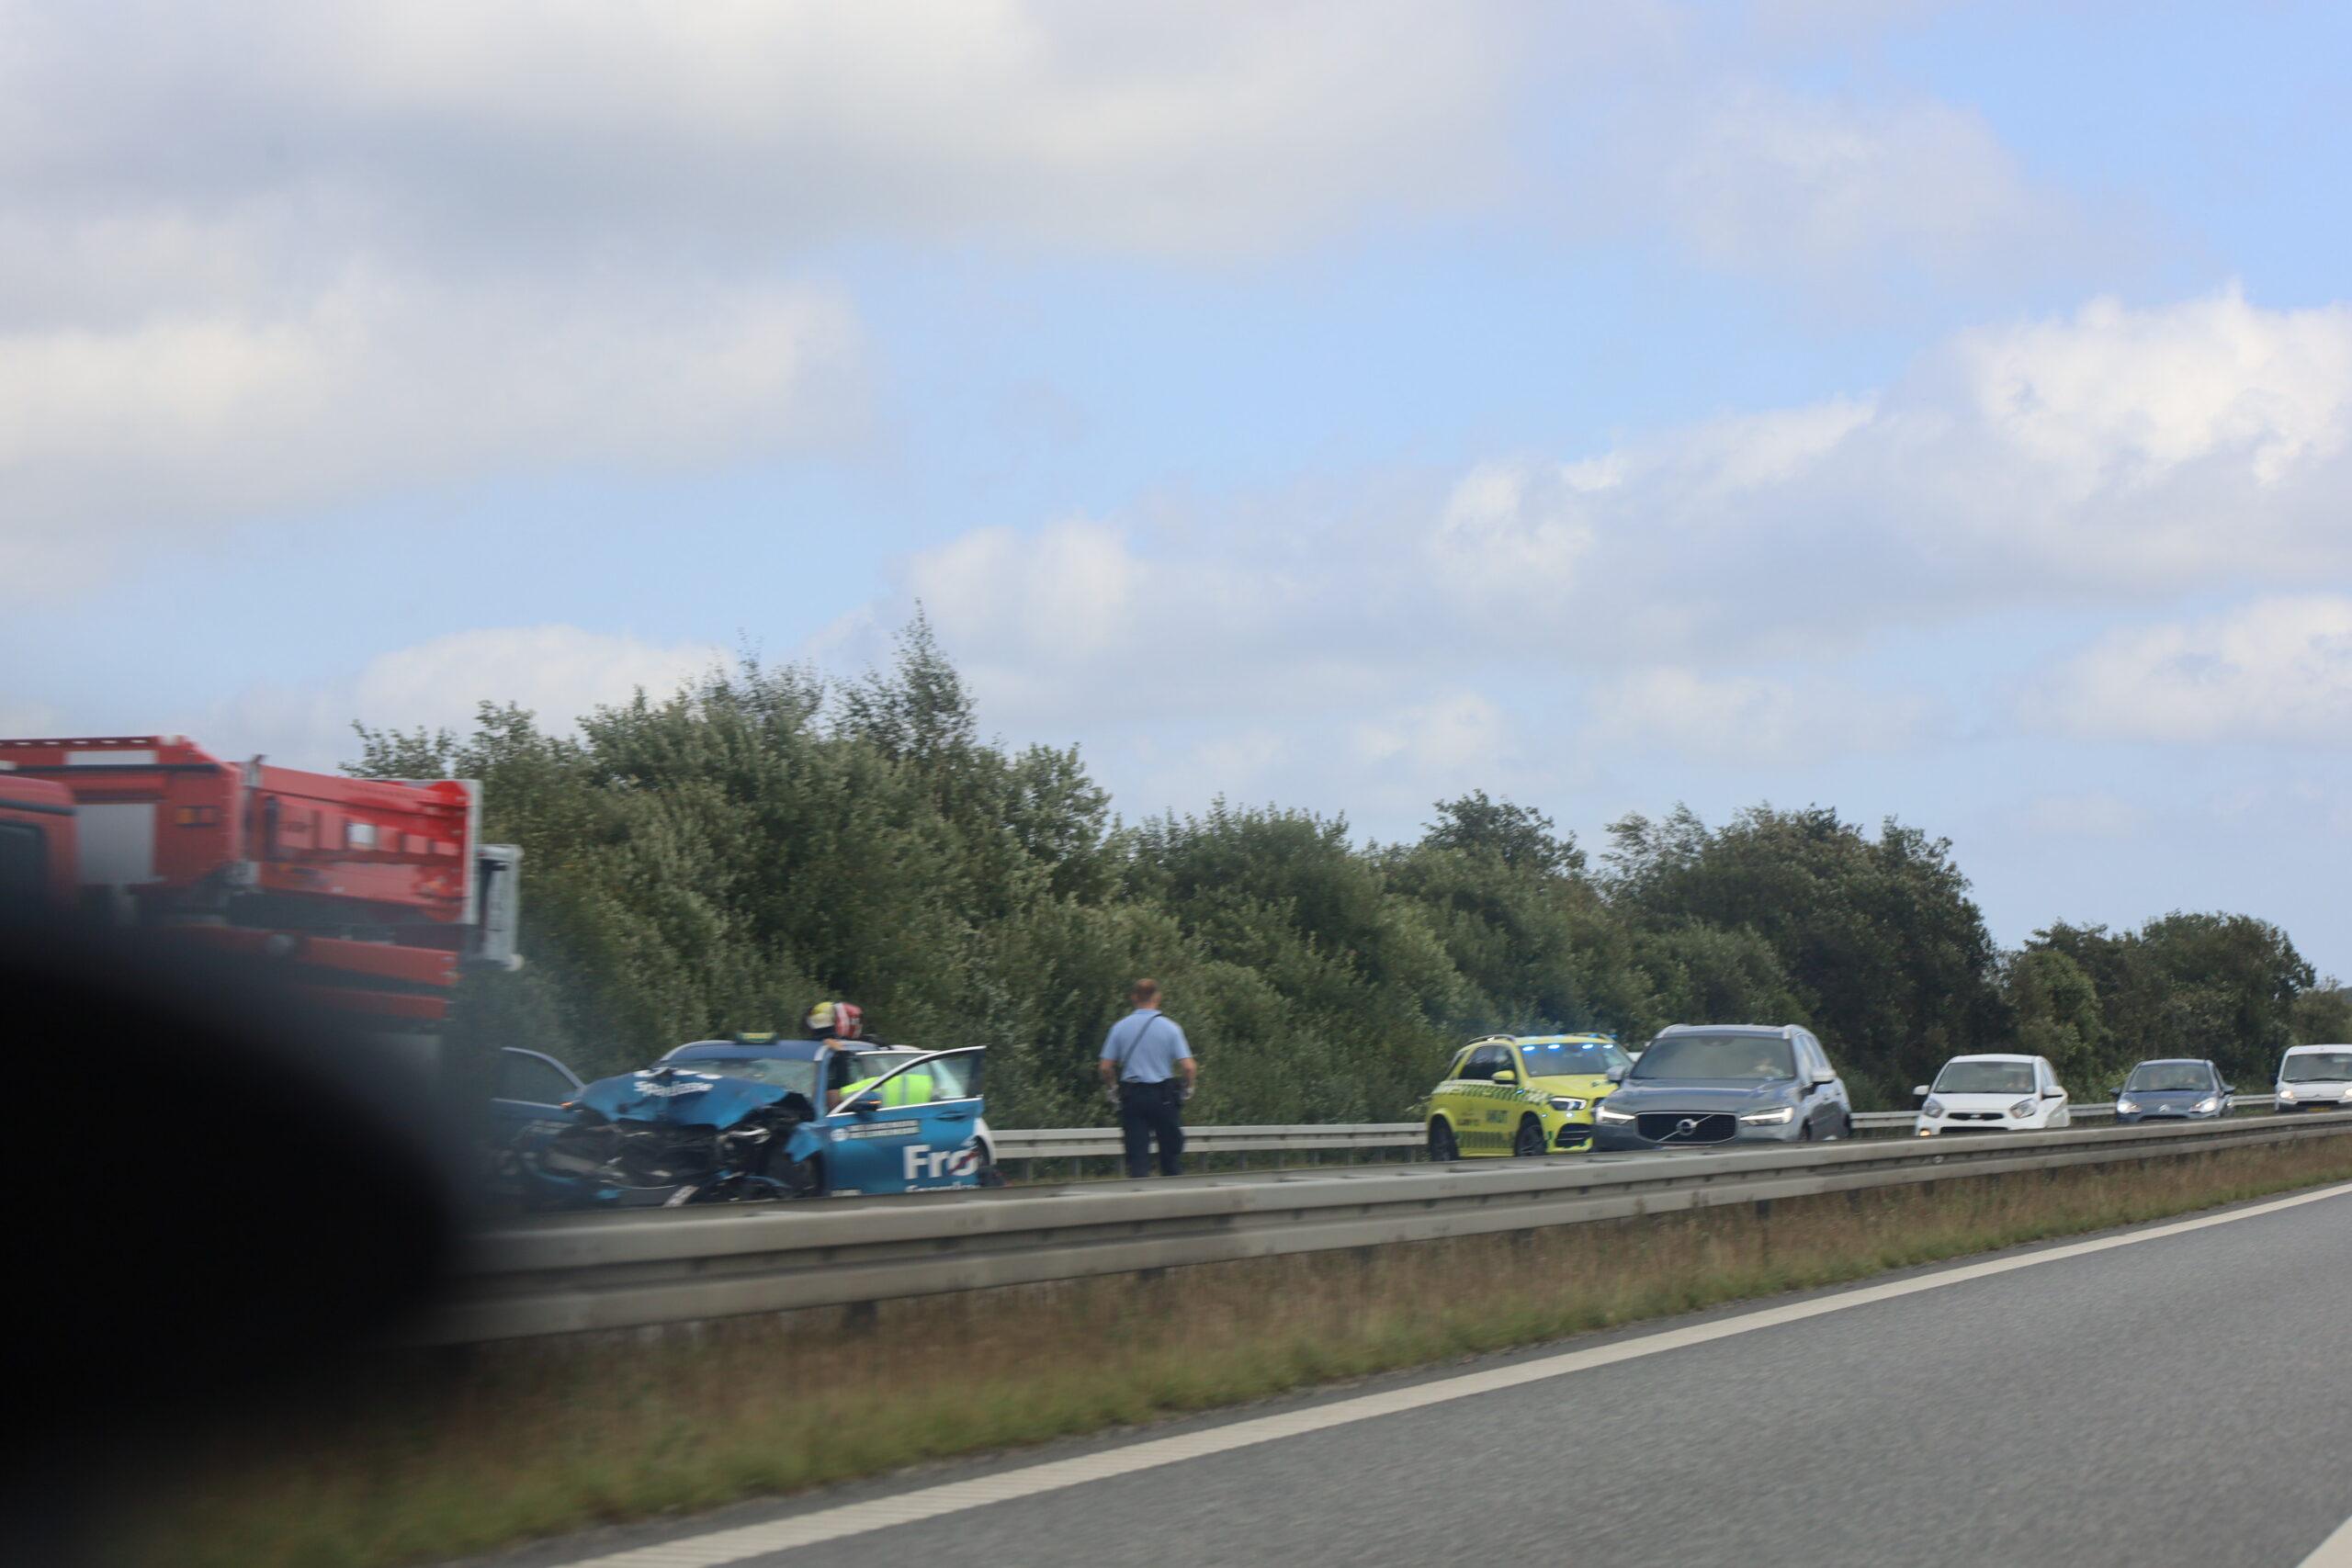 OPDATERING: Voldsomt trafikuheld på motorvej nær Holsted - taxa smadret